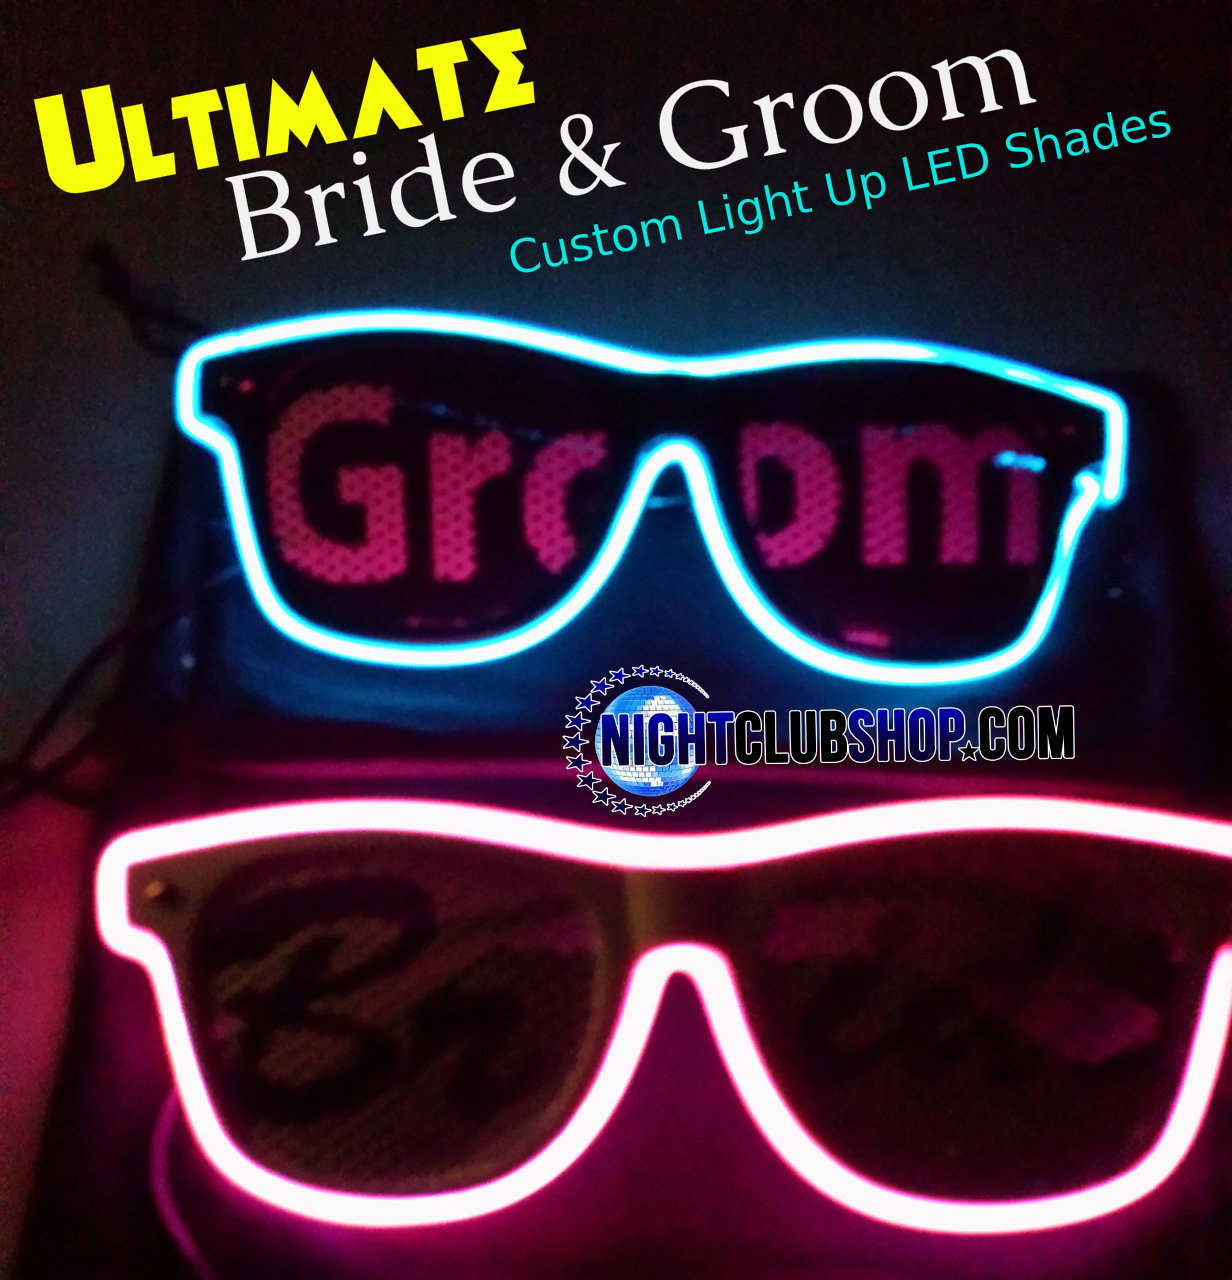 wedding-custom-bride-and-groom-sun-glasses-led-neon-glow-shades-25374.1406043635.1280.1280.jpg